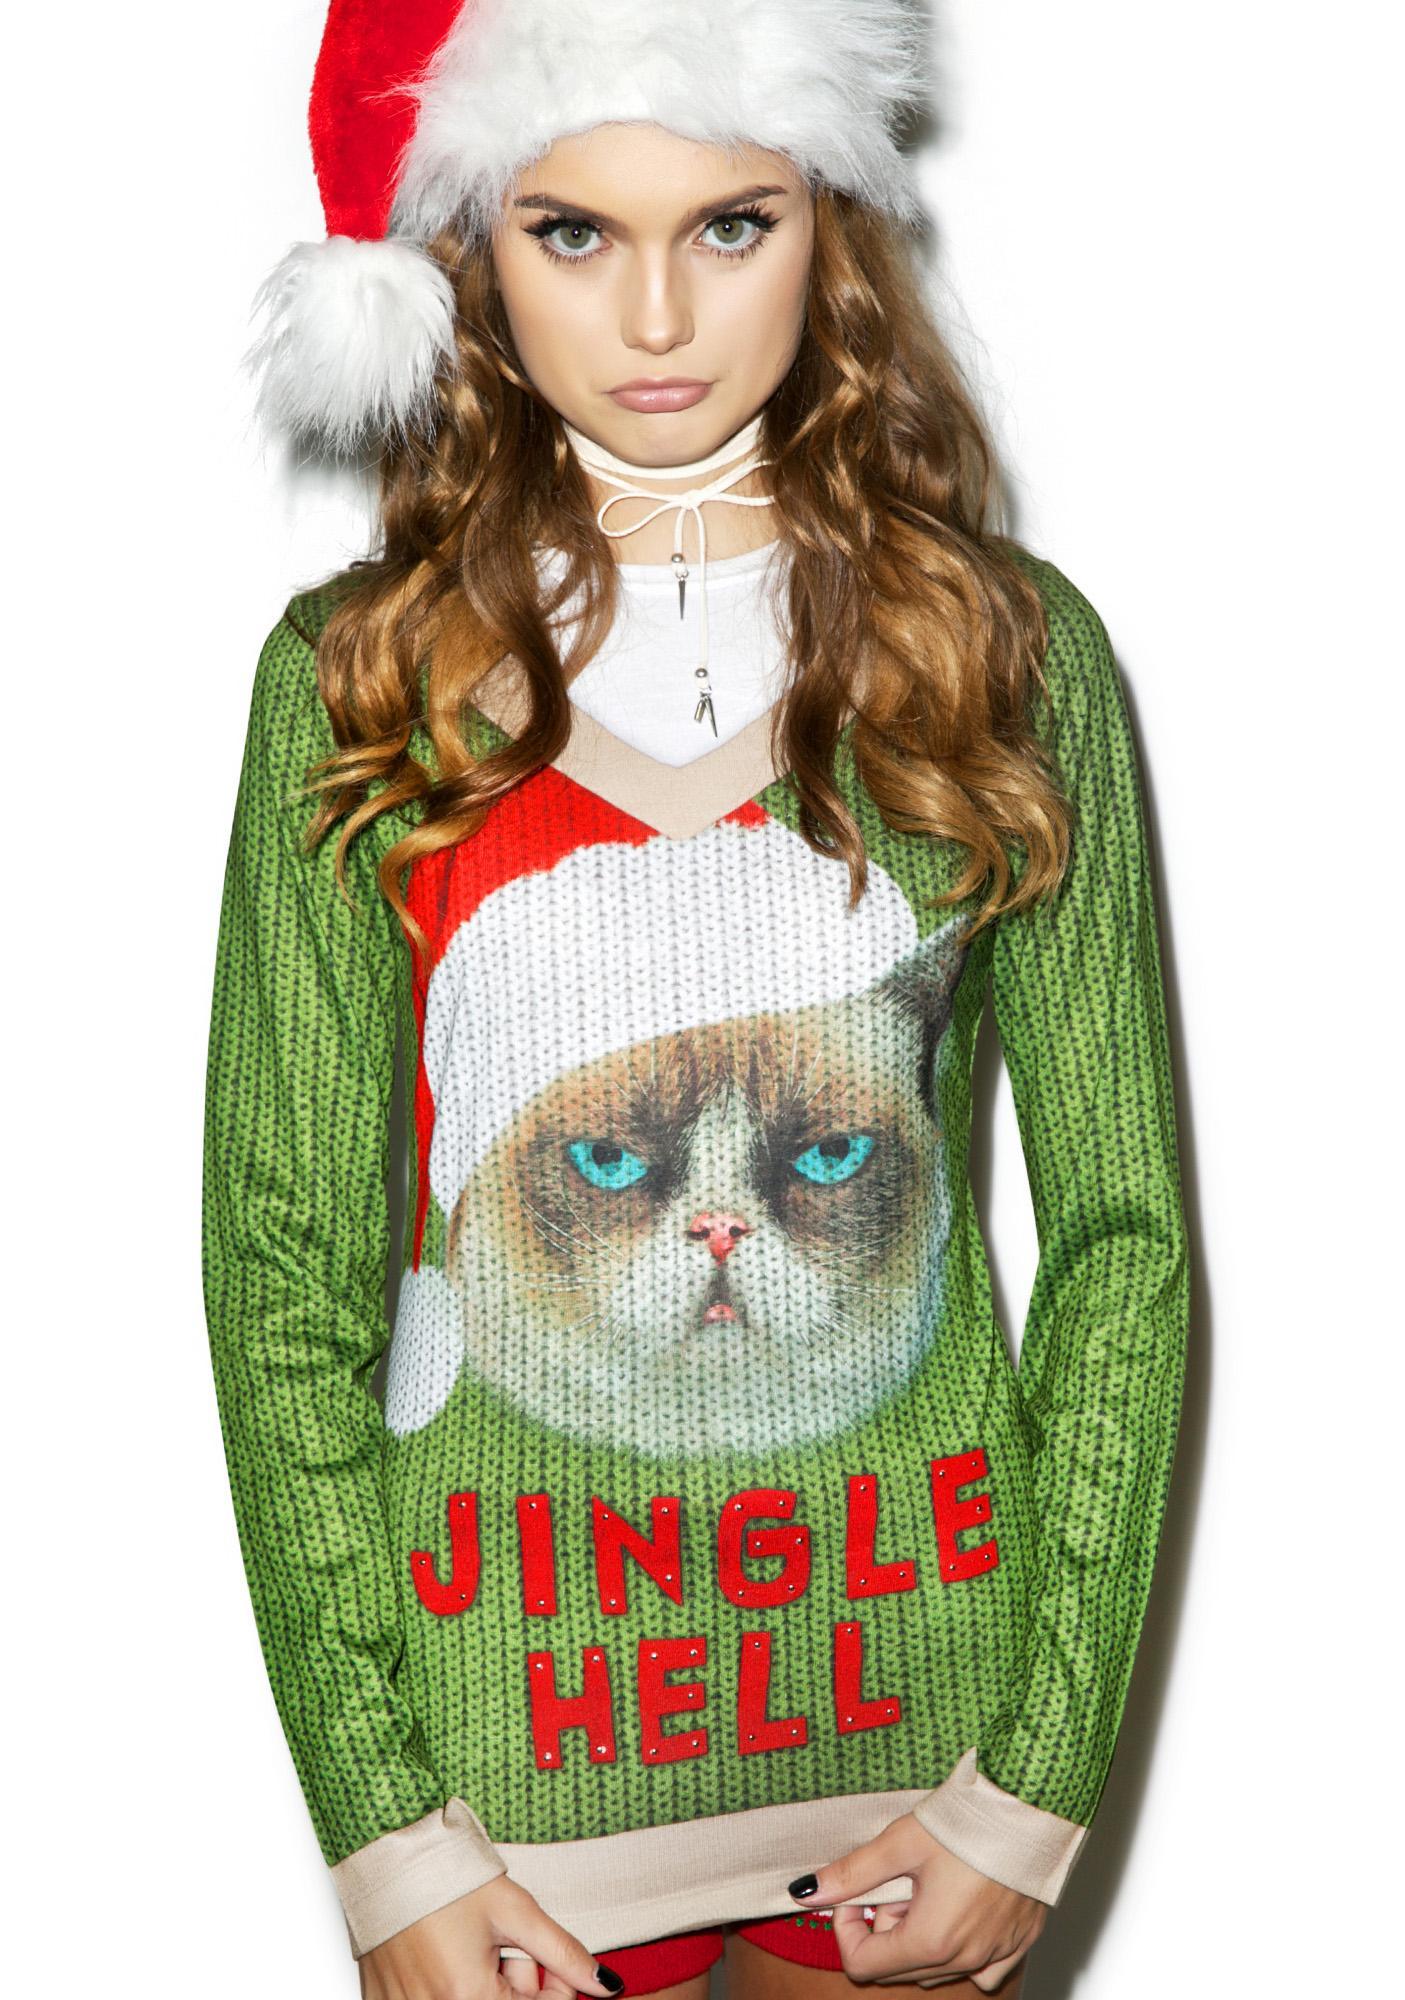 Jingle Hell Sweater Tee